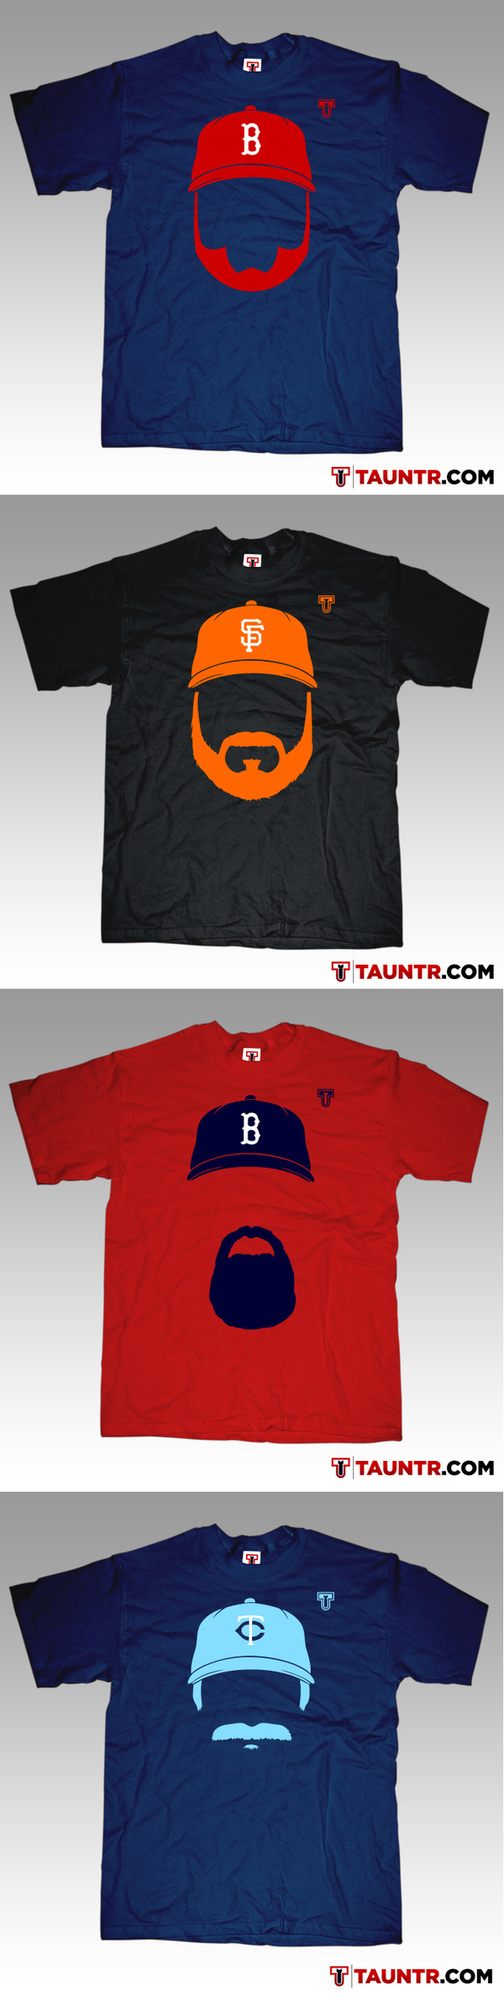 More MLB Mustache Shirts